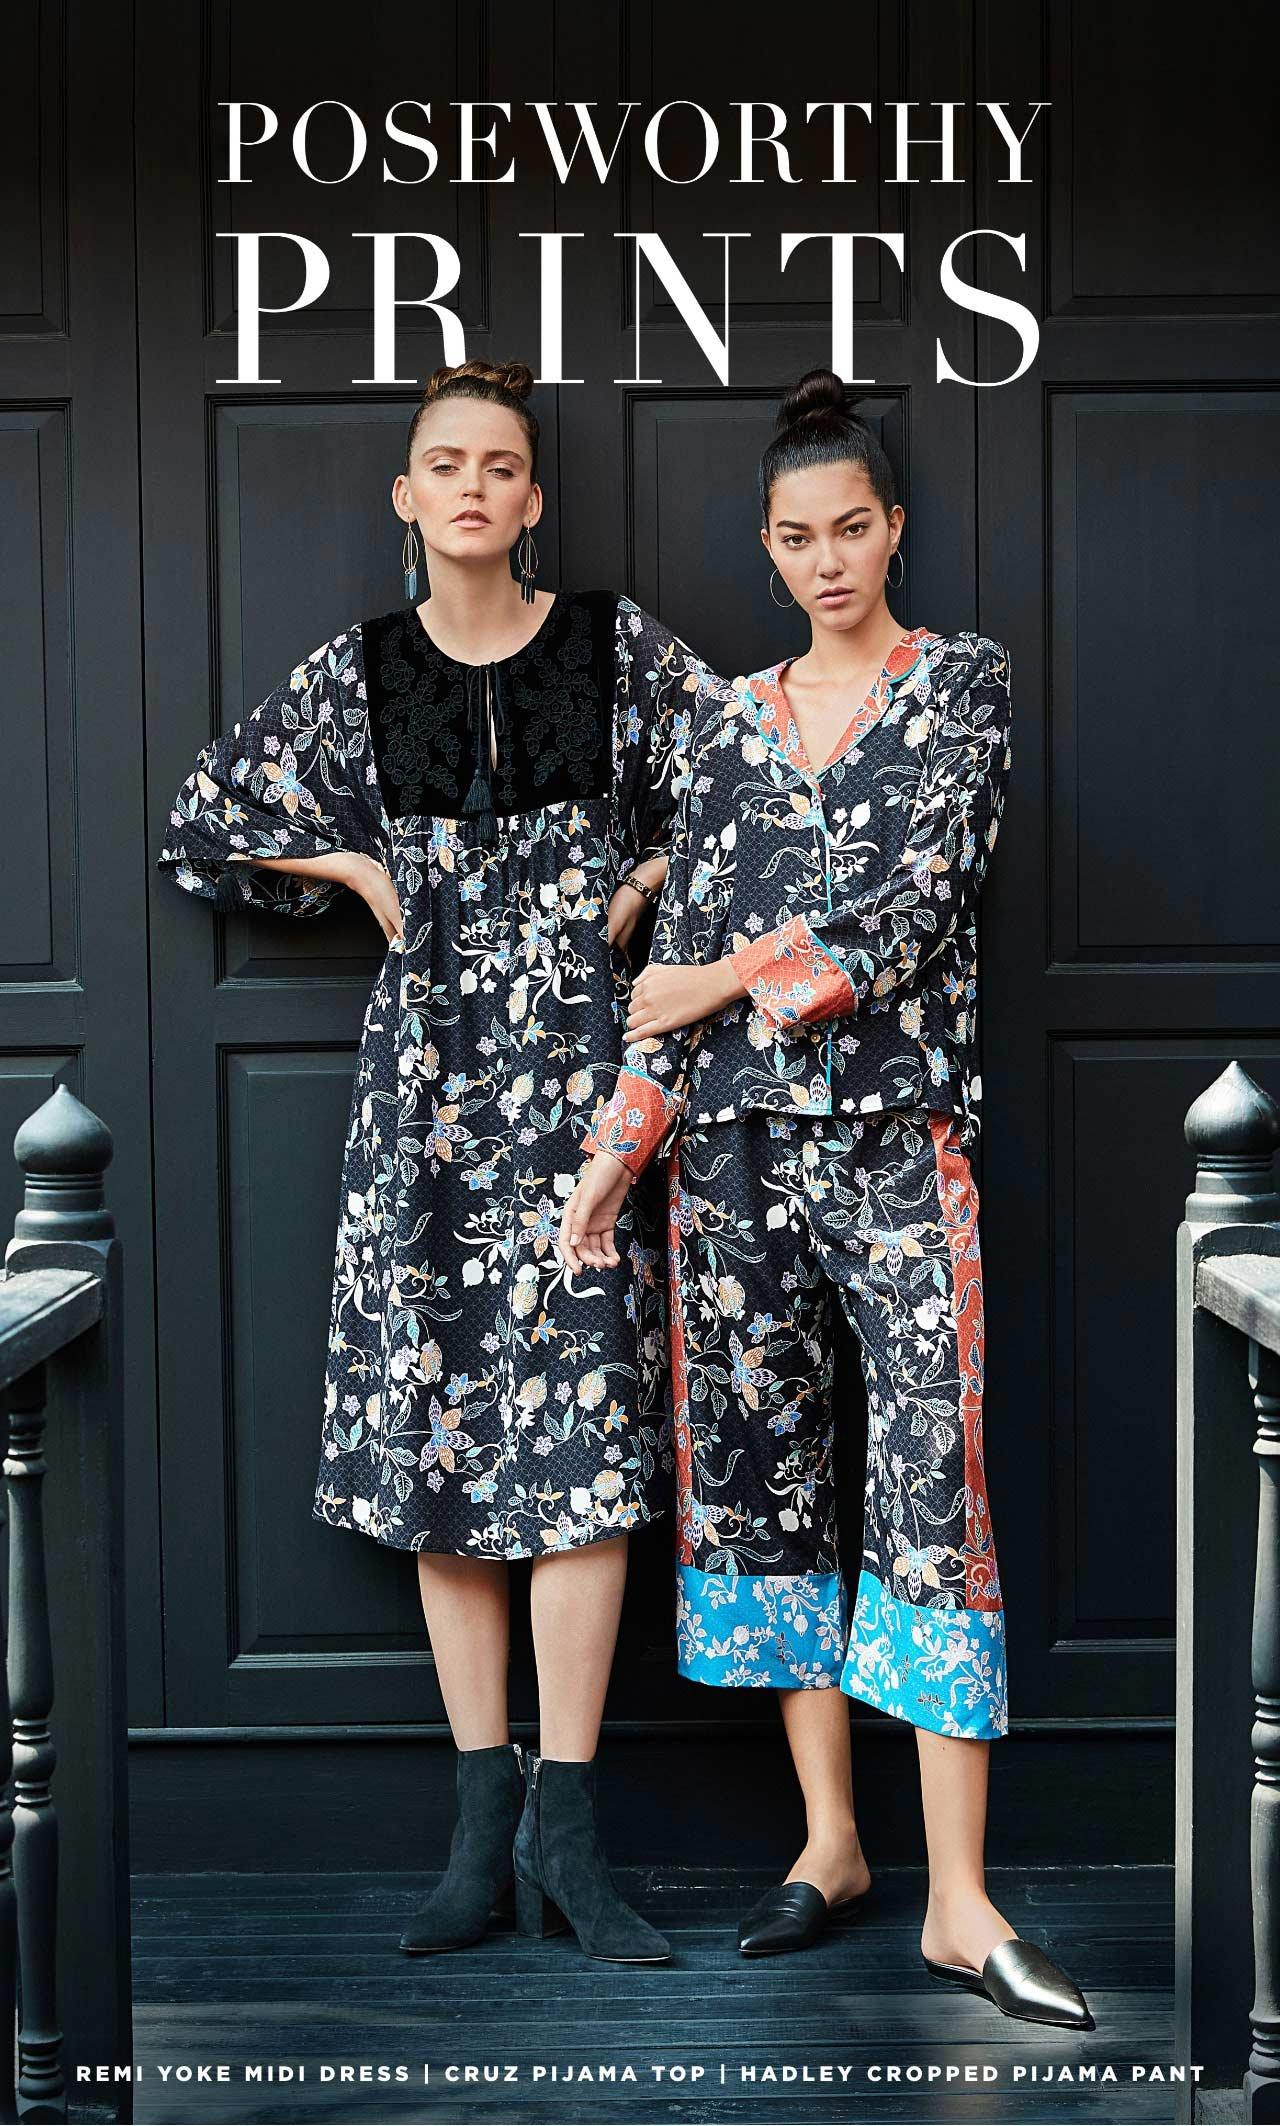 Poseworthy Prints - Remi Yoke Midi Dress   Cruz Pijama Top   Hadley Cropped Pijama Pant